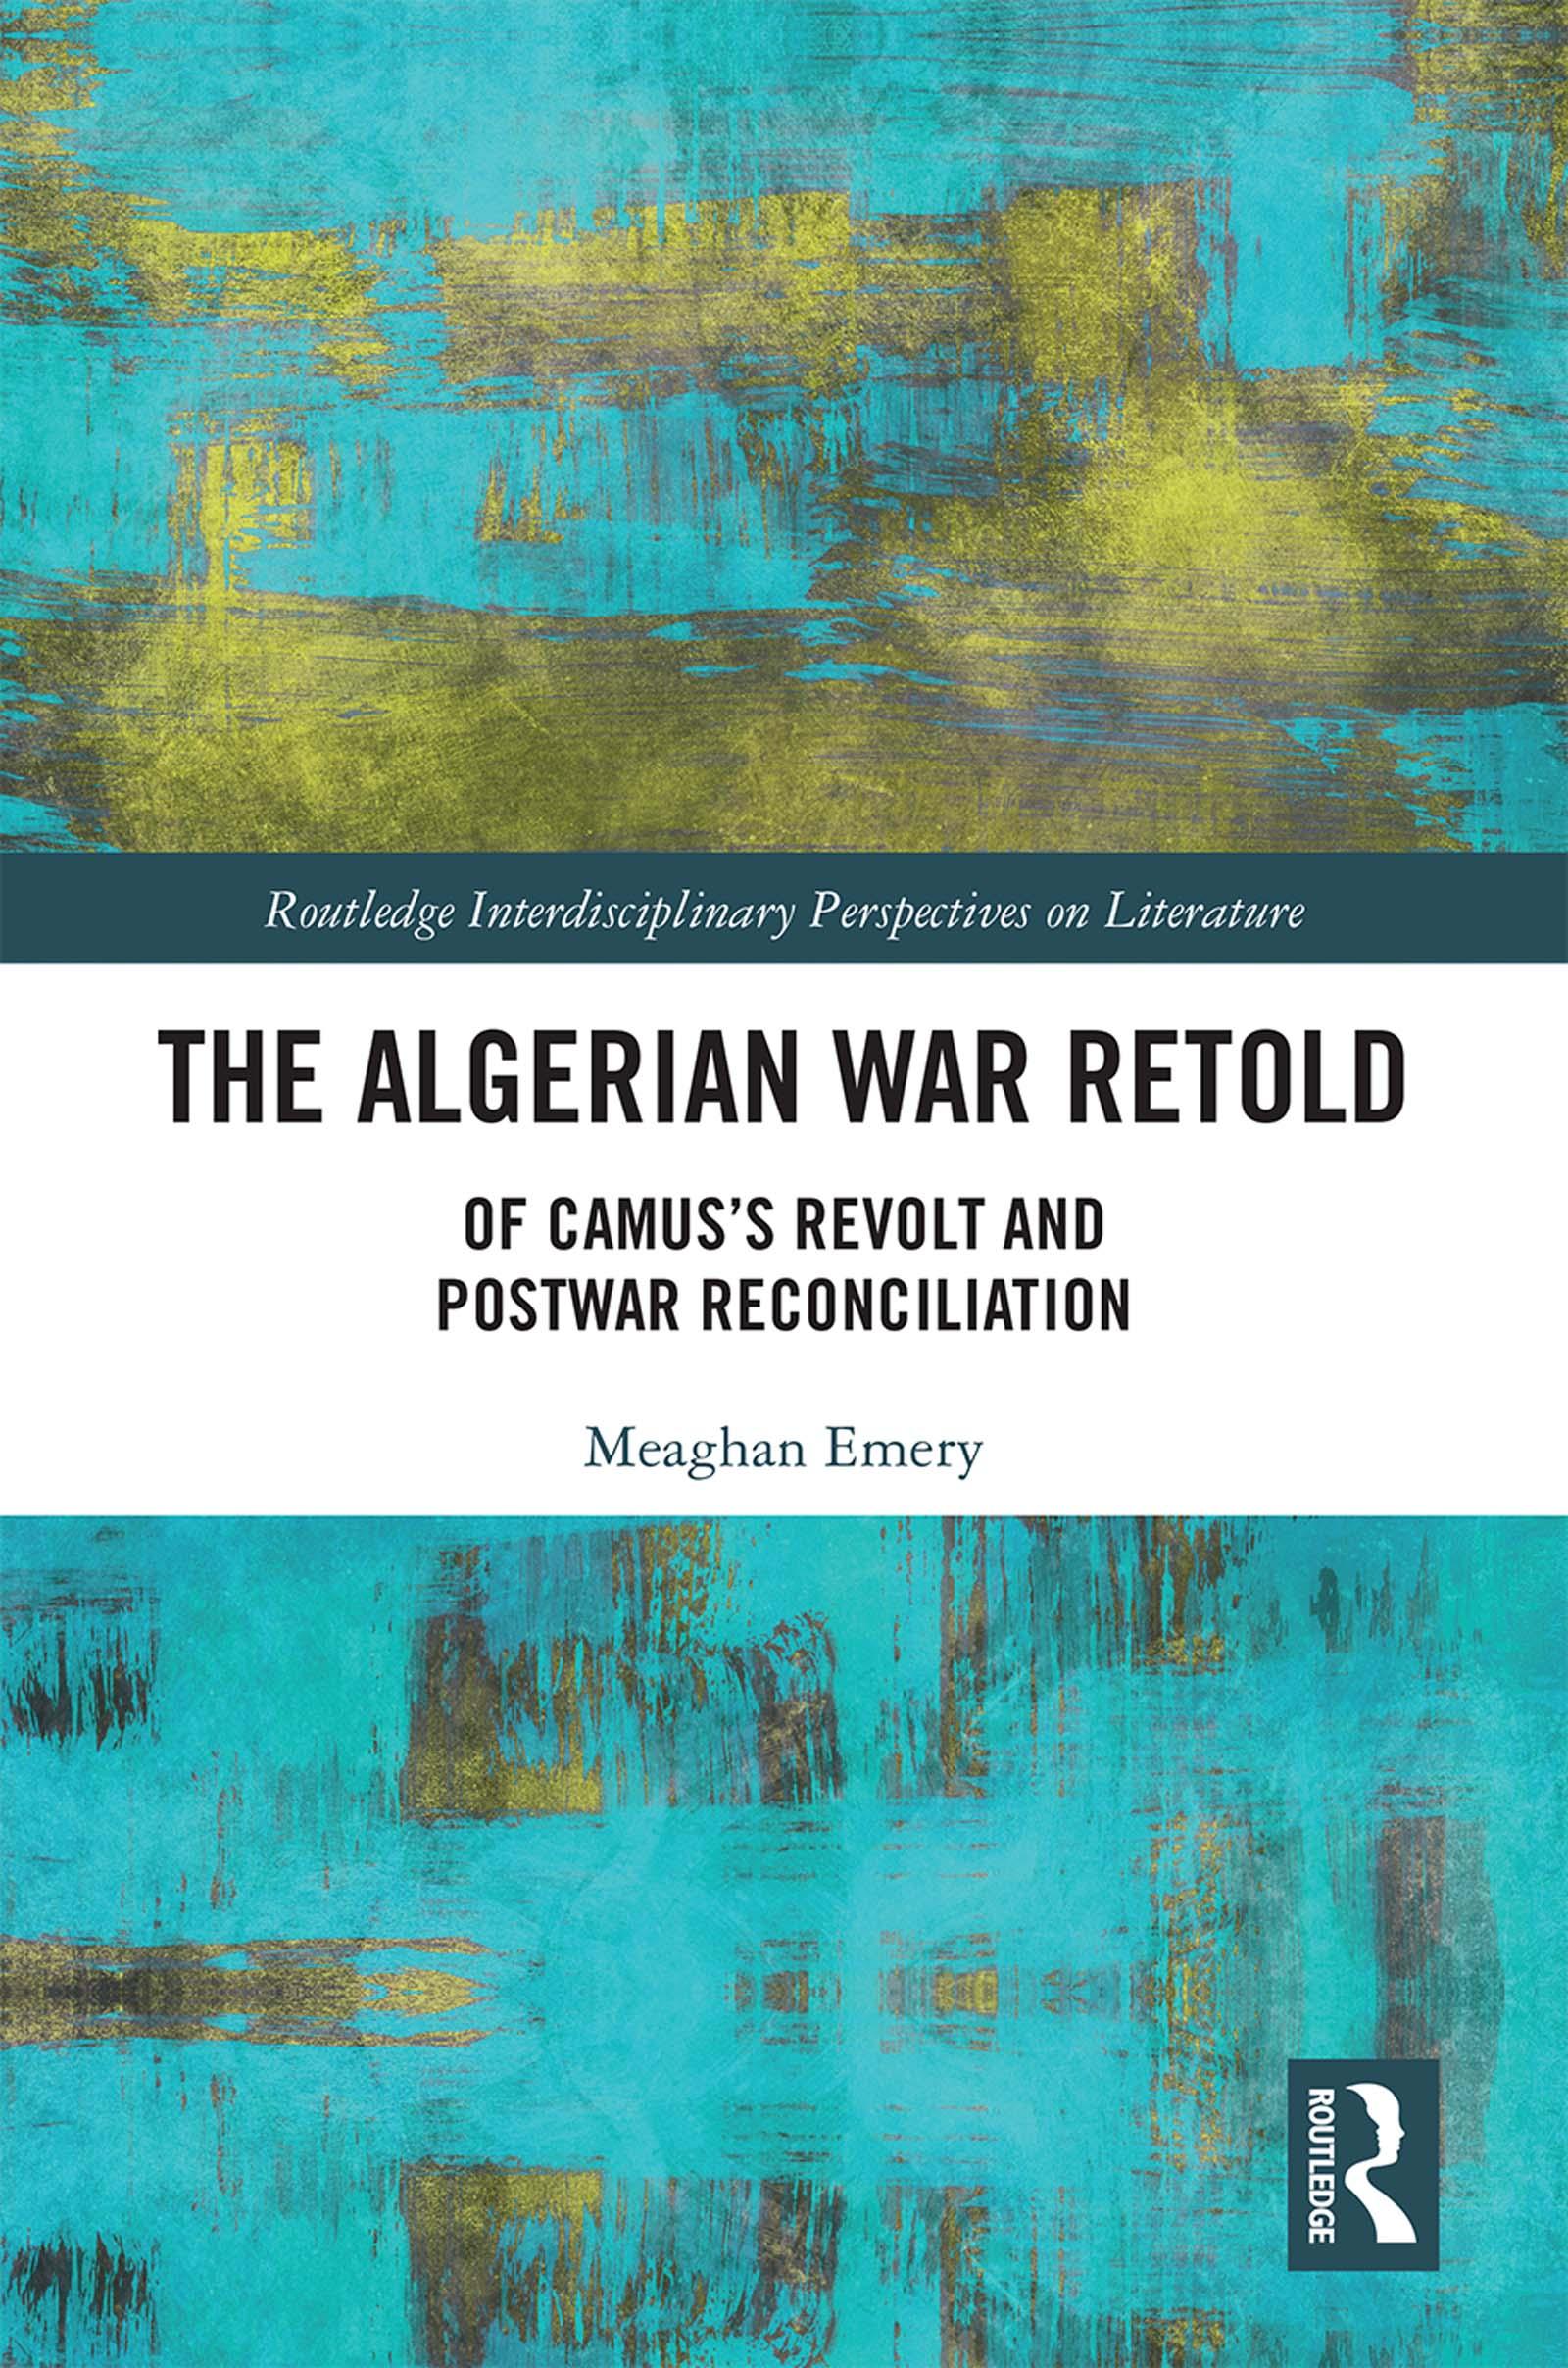 The Algerian War Retold